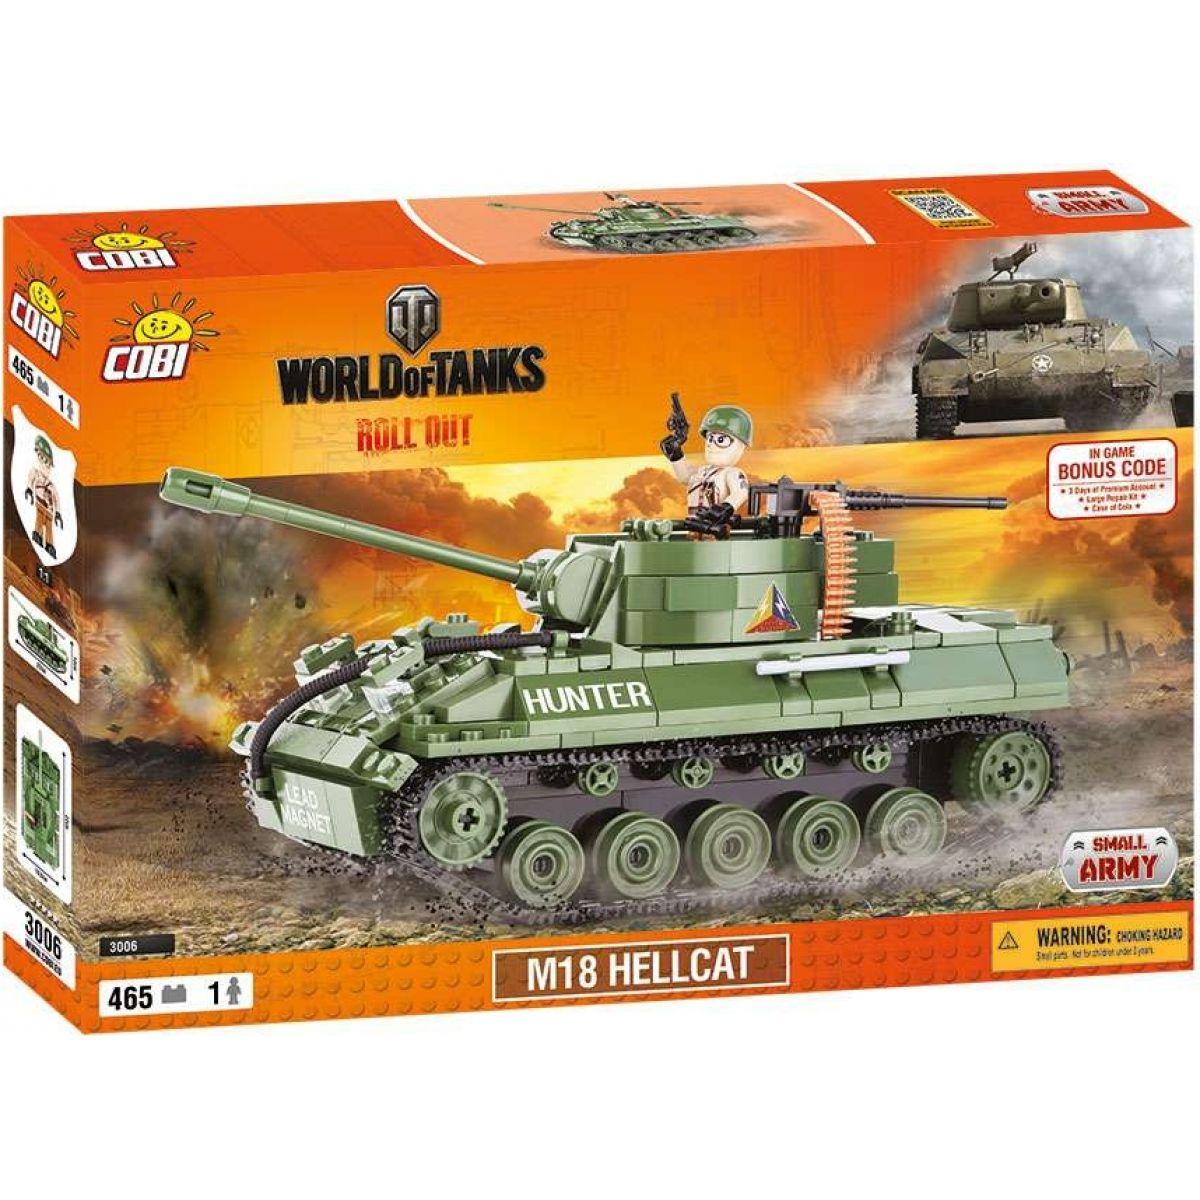 Cobi 3006 World of Tanks M18 Hellcat 465 k